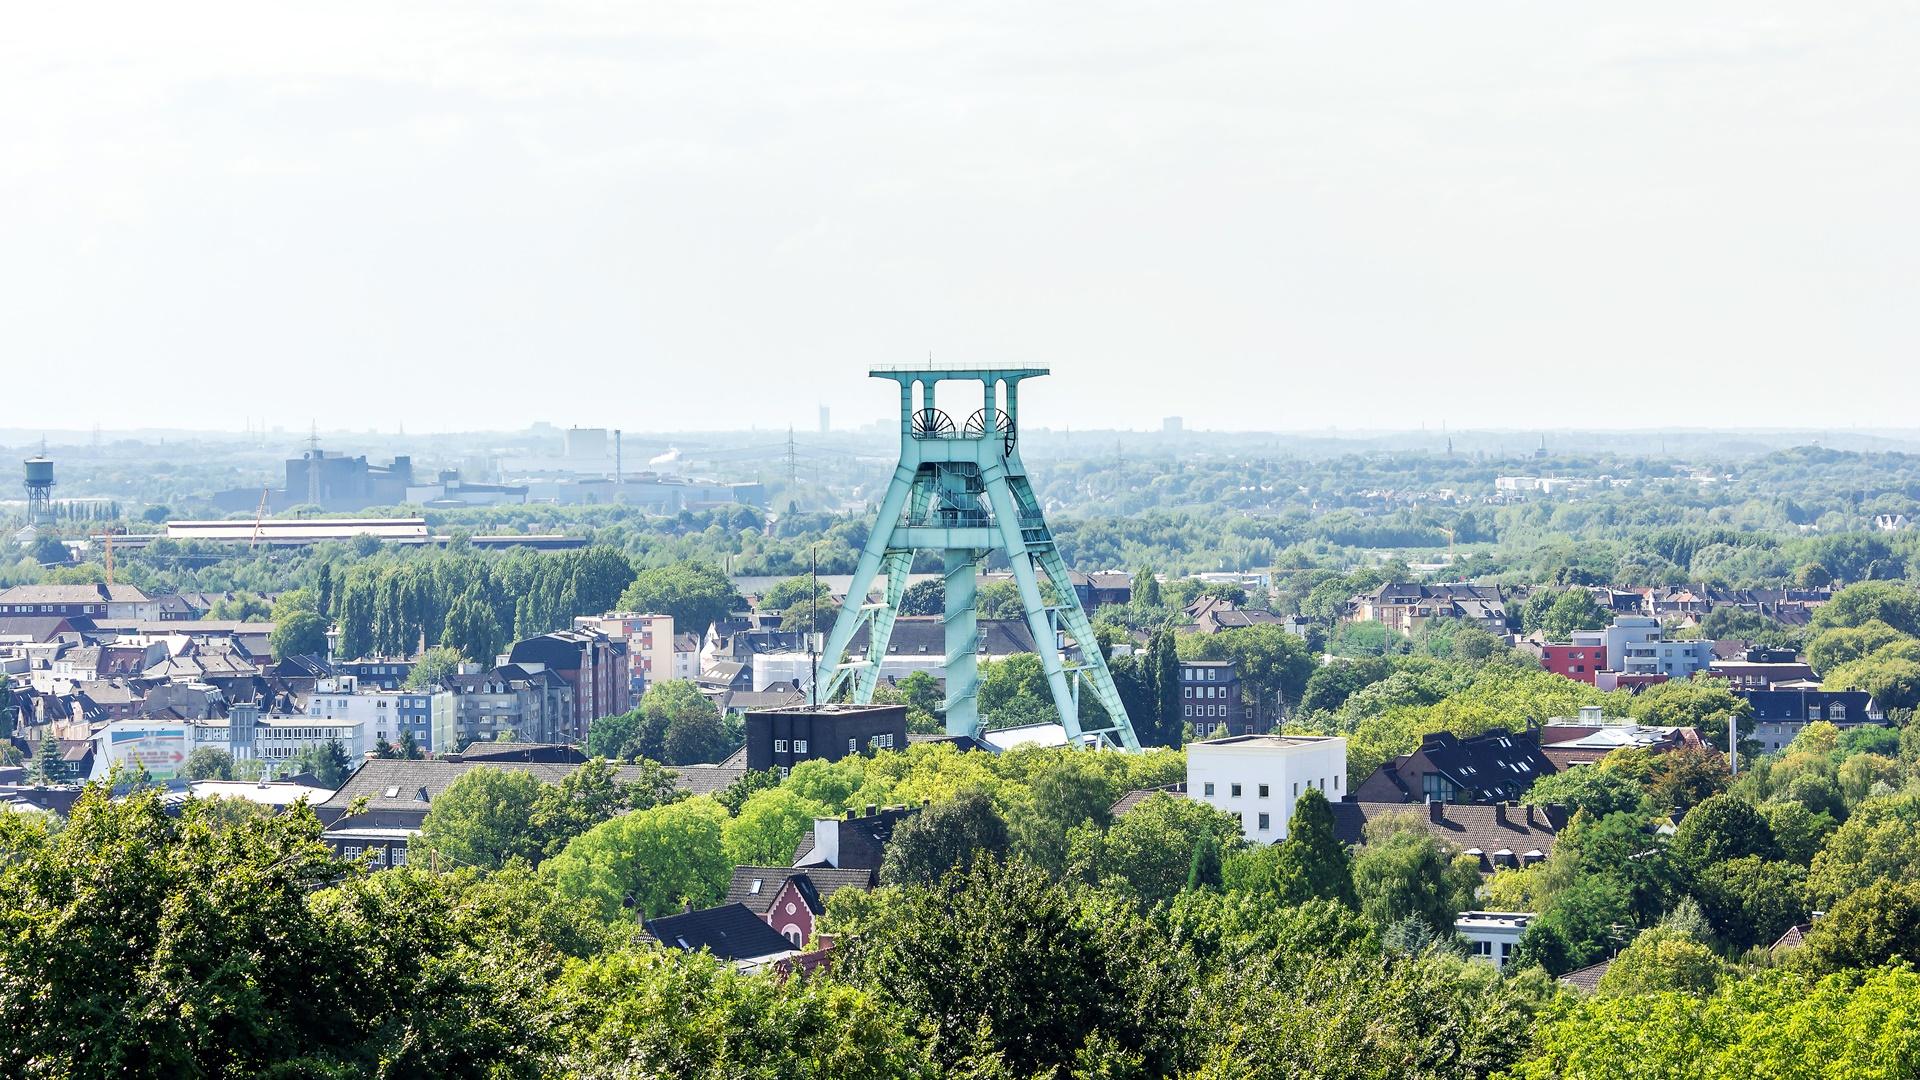 Blick auf den Frderturm in Bochum | Stadtbild